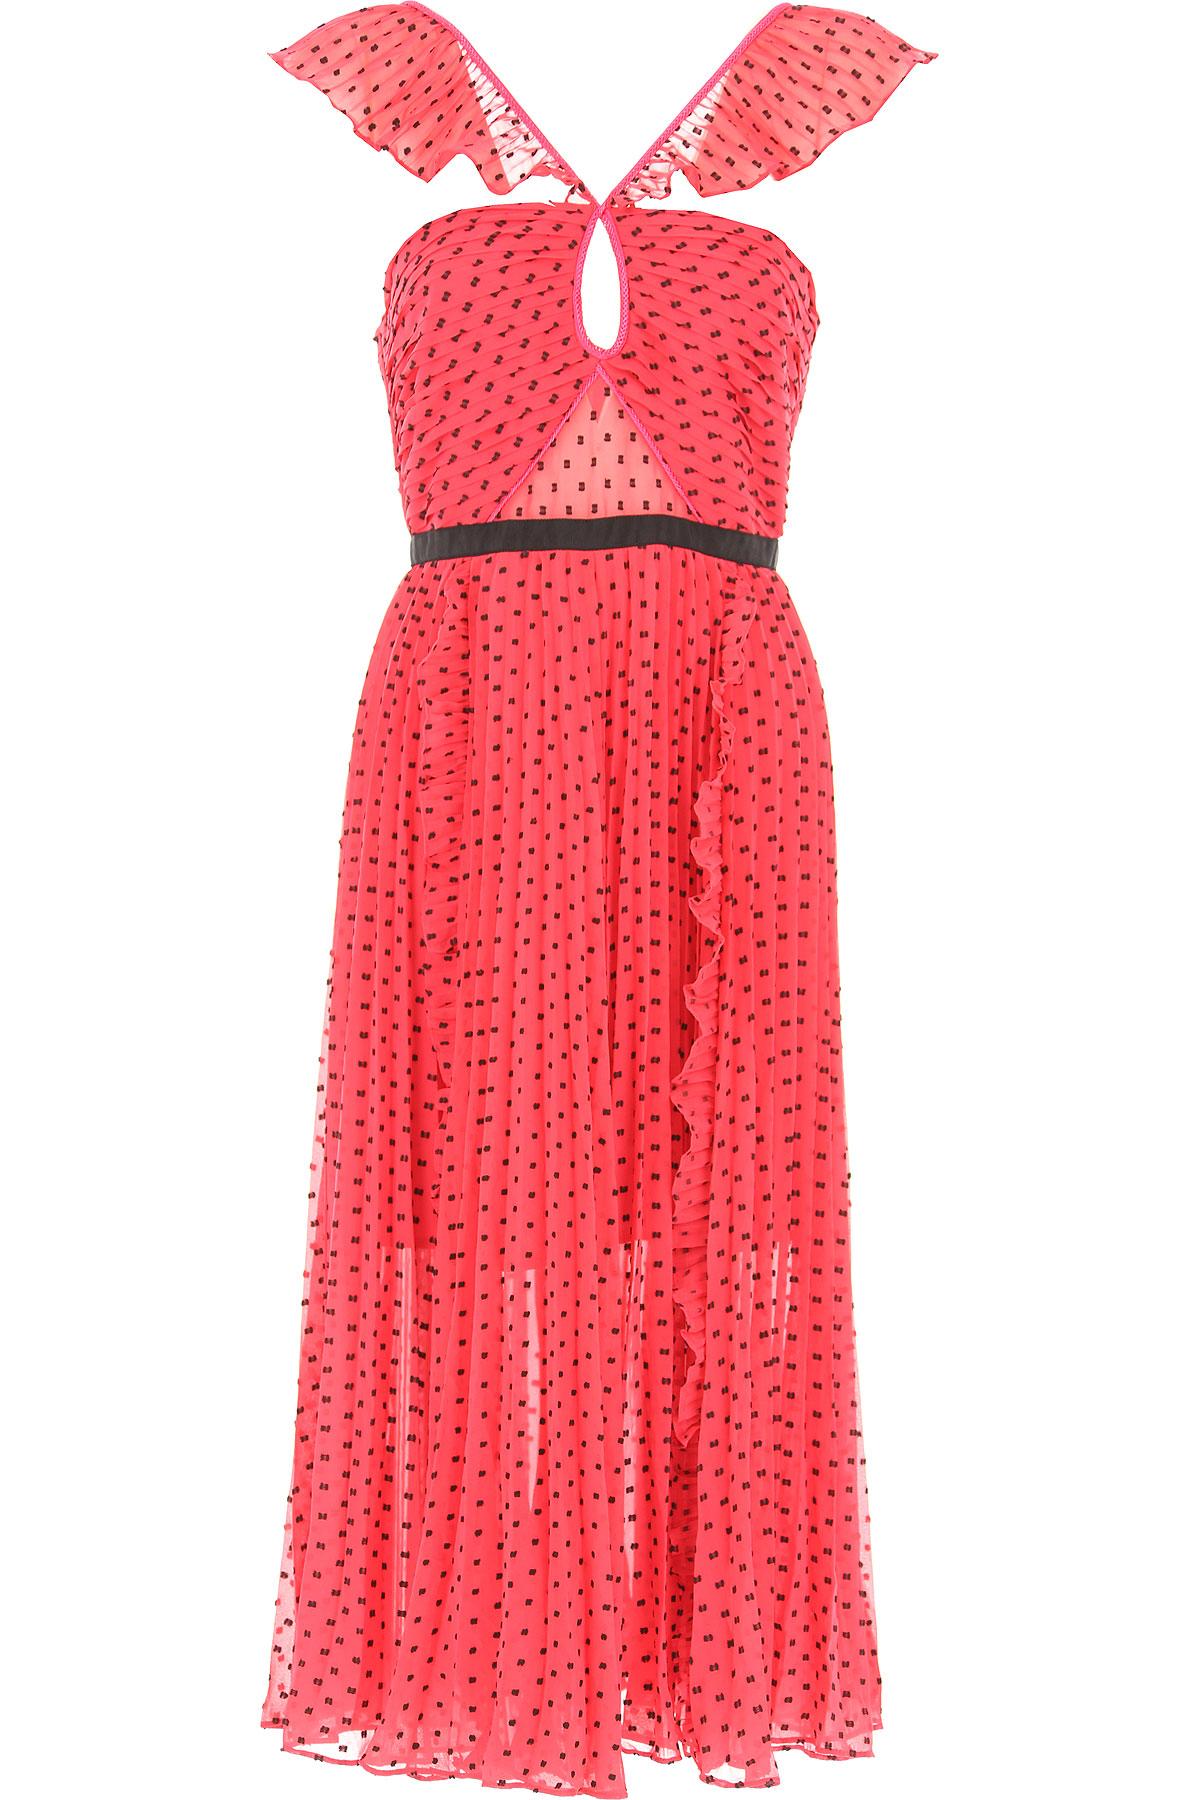 Image of Self-portrait Dress for Women, Evening Cocktail Party, Fuchsia, polyester, 2017, UK 8 - US 6 - EU 40 UK 10 - US 8 - EU 42 UK 12 - US 10 - EU 44